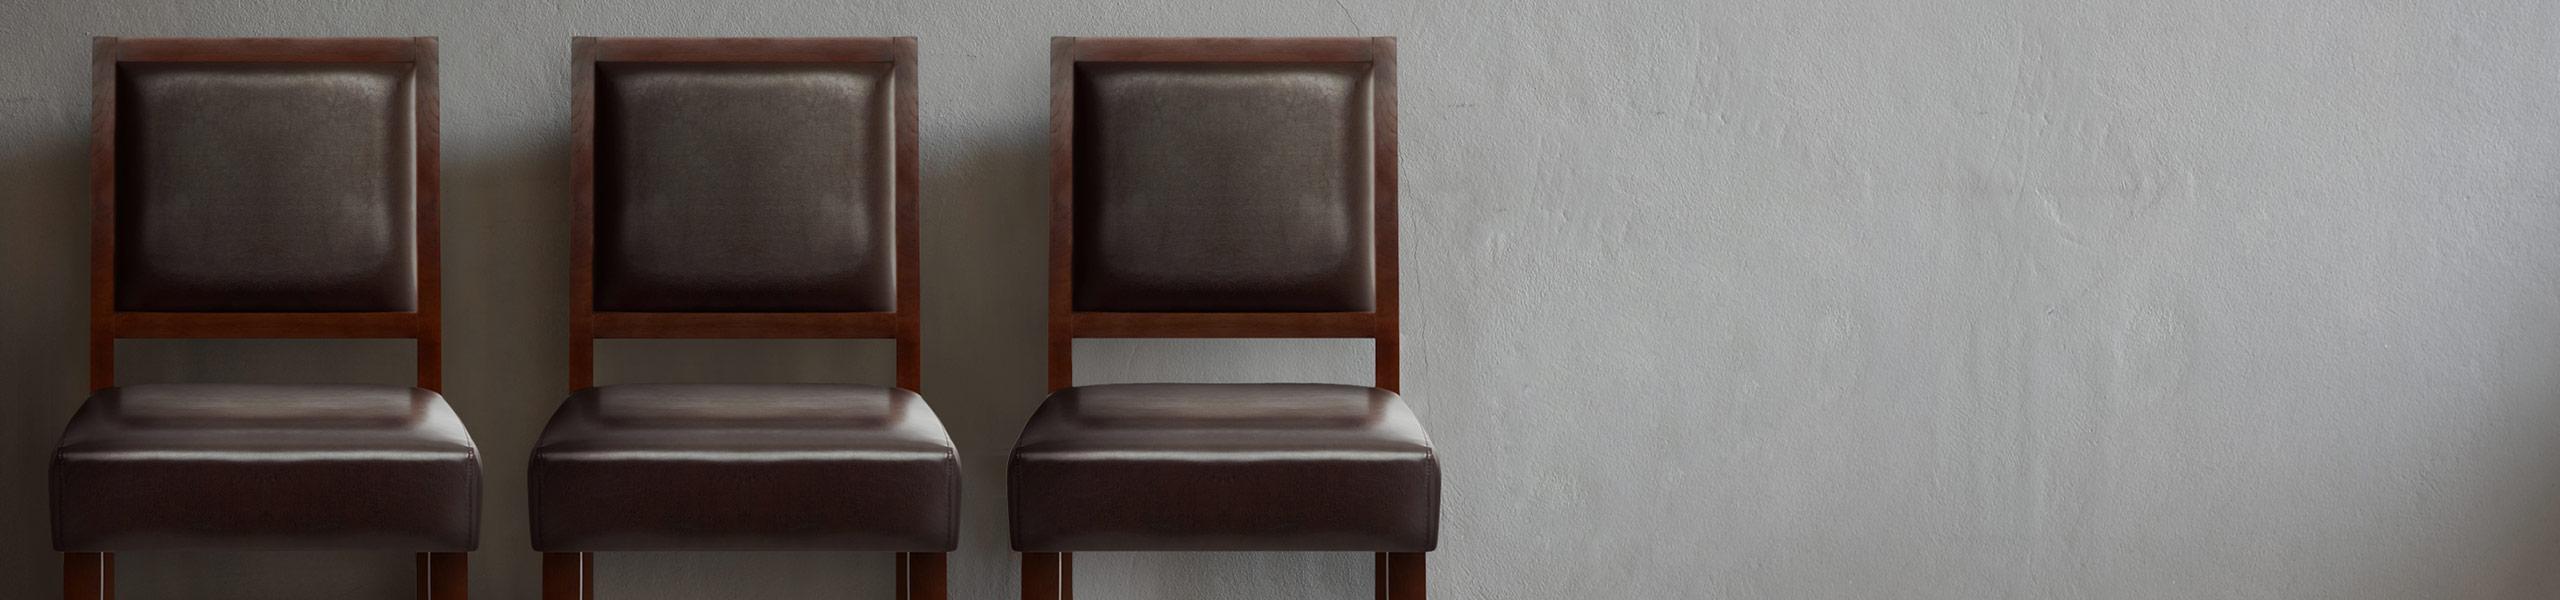 Prime Jasper Leather Bar Stool Walnut Brown Andrewgaddart Wooden Chair Designs For Living Room Andrewgaddartcom